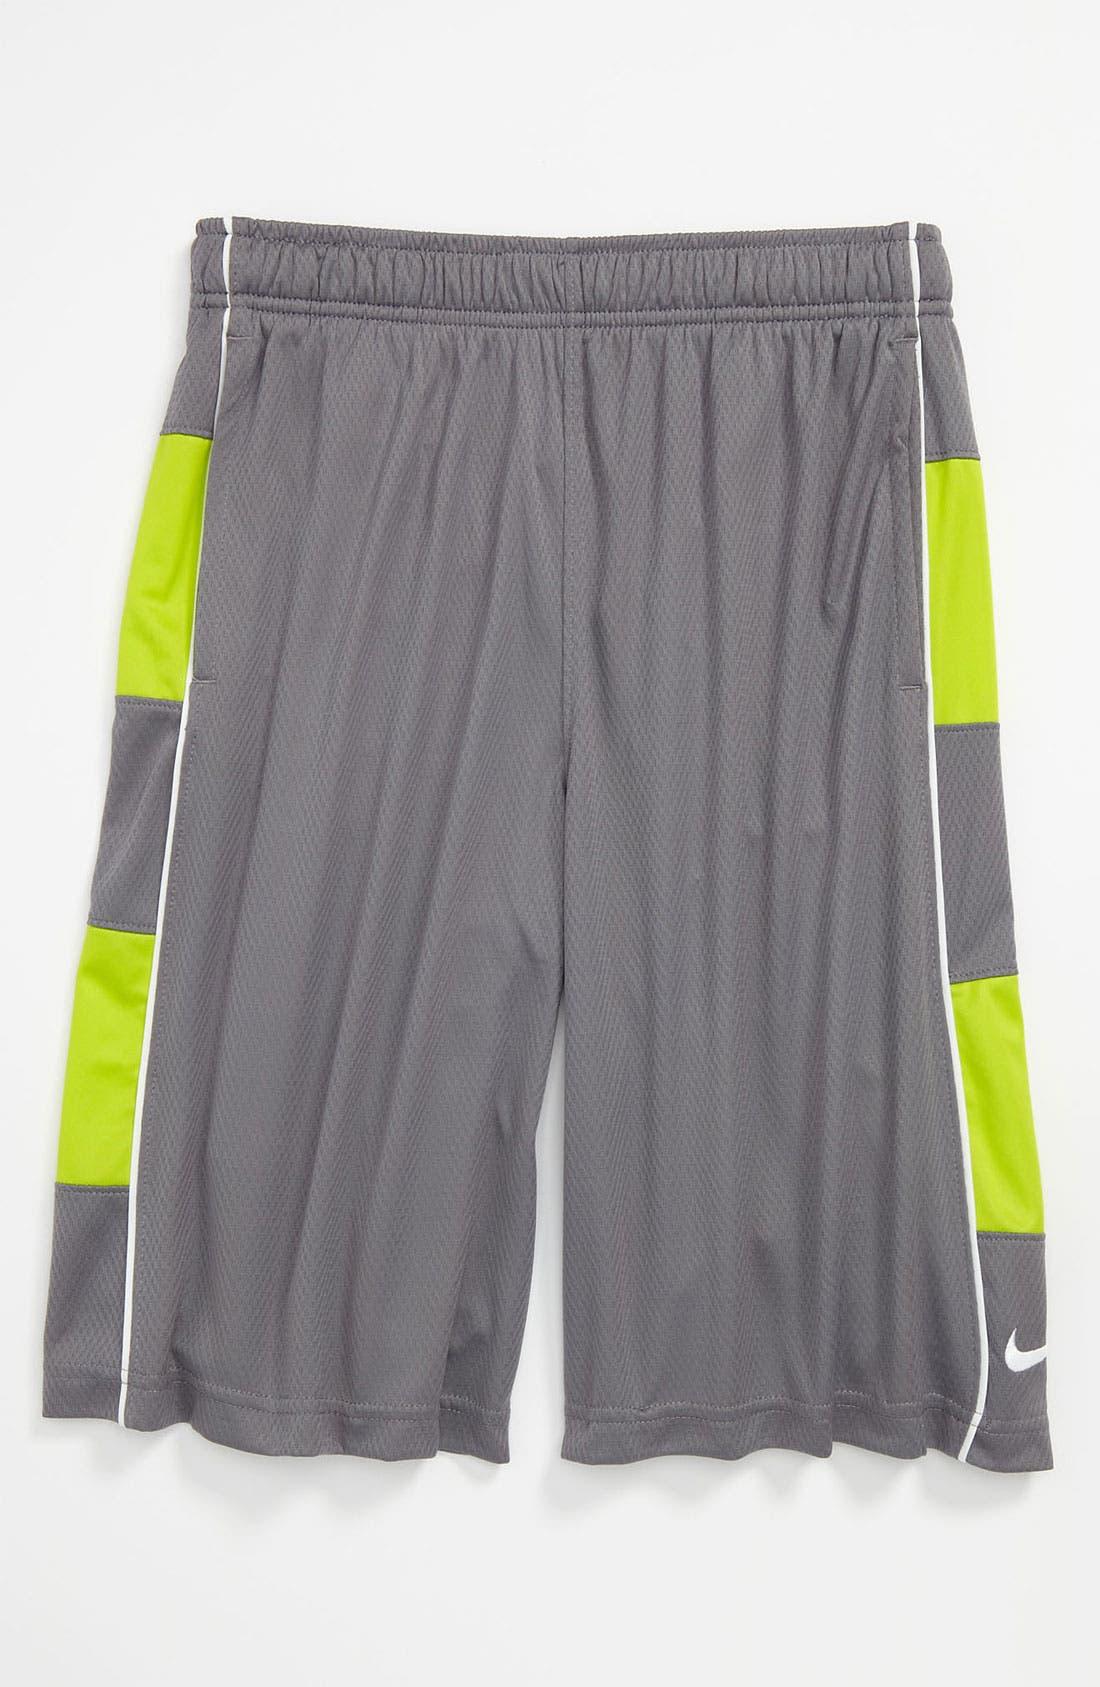 Alternate Image 1 Selected - Nike 'Rivalry' Dri-FIT Shorts (Big Boys)